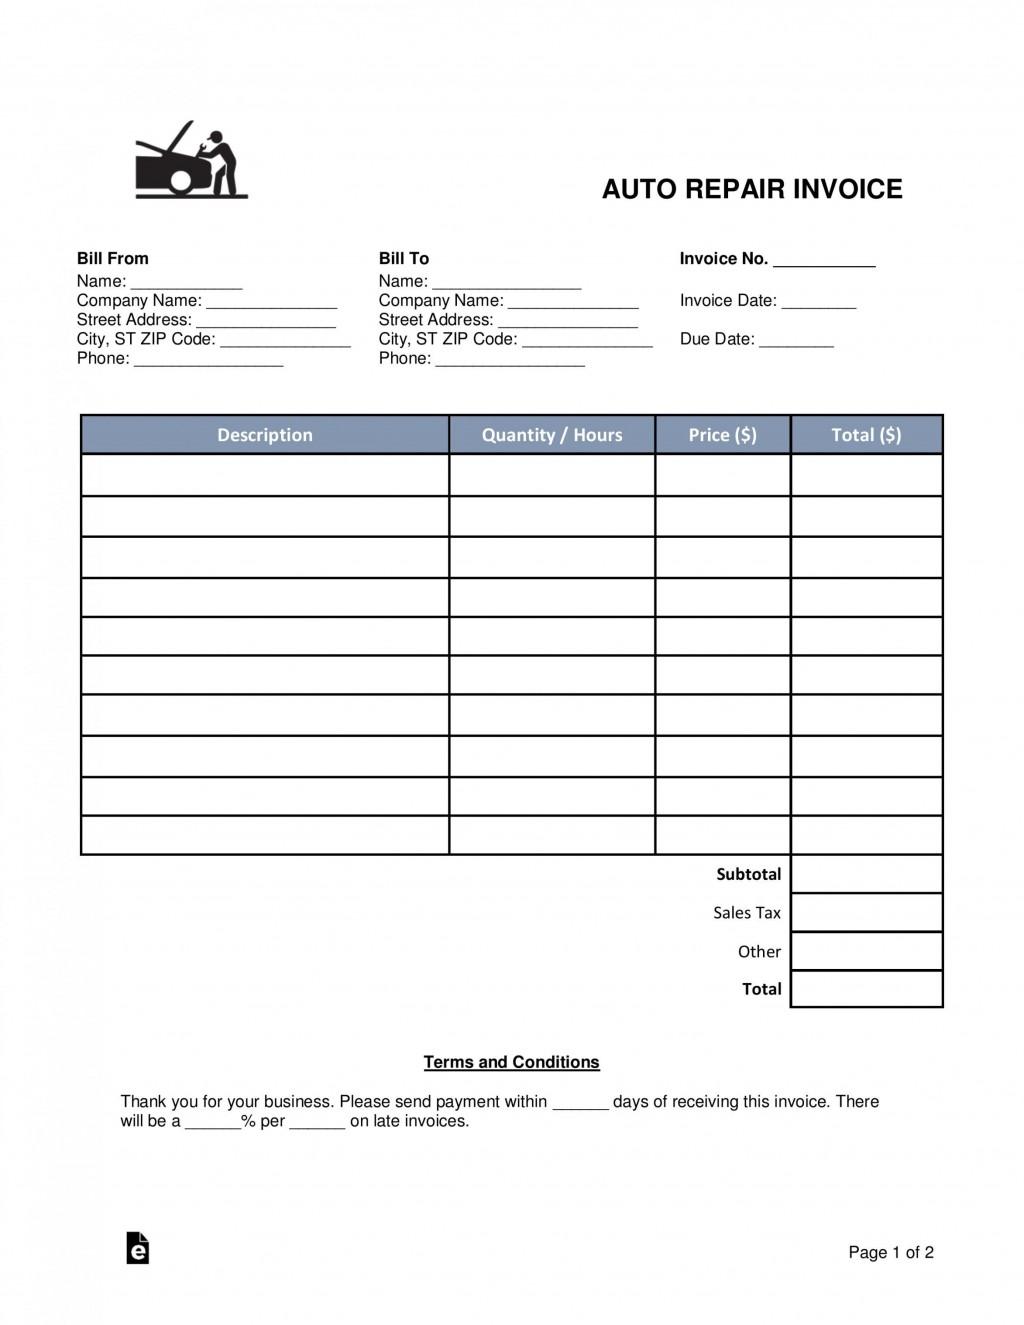 002 Surprising Auto Repair Work Order Template Excel Free Photo Large